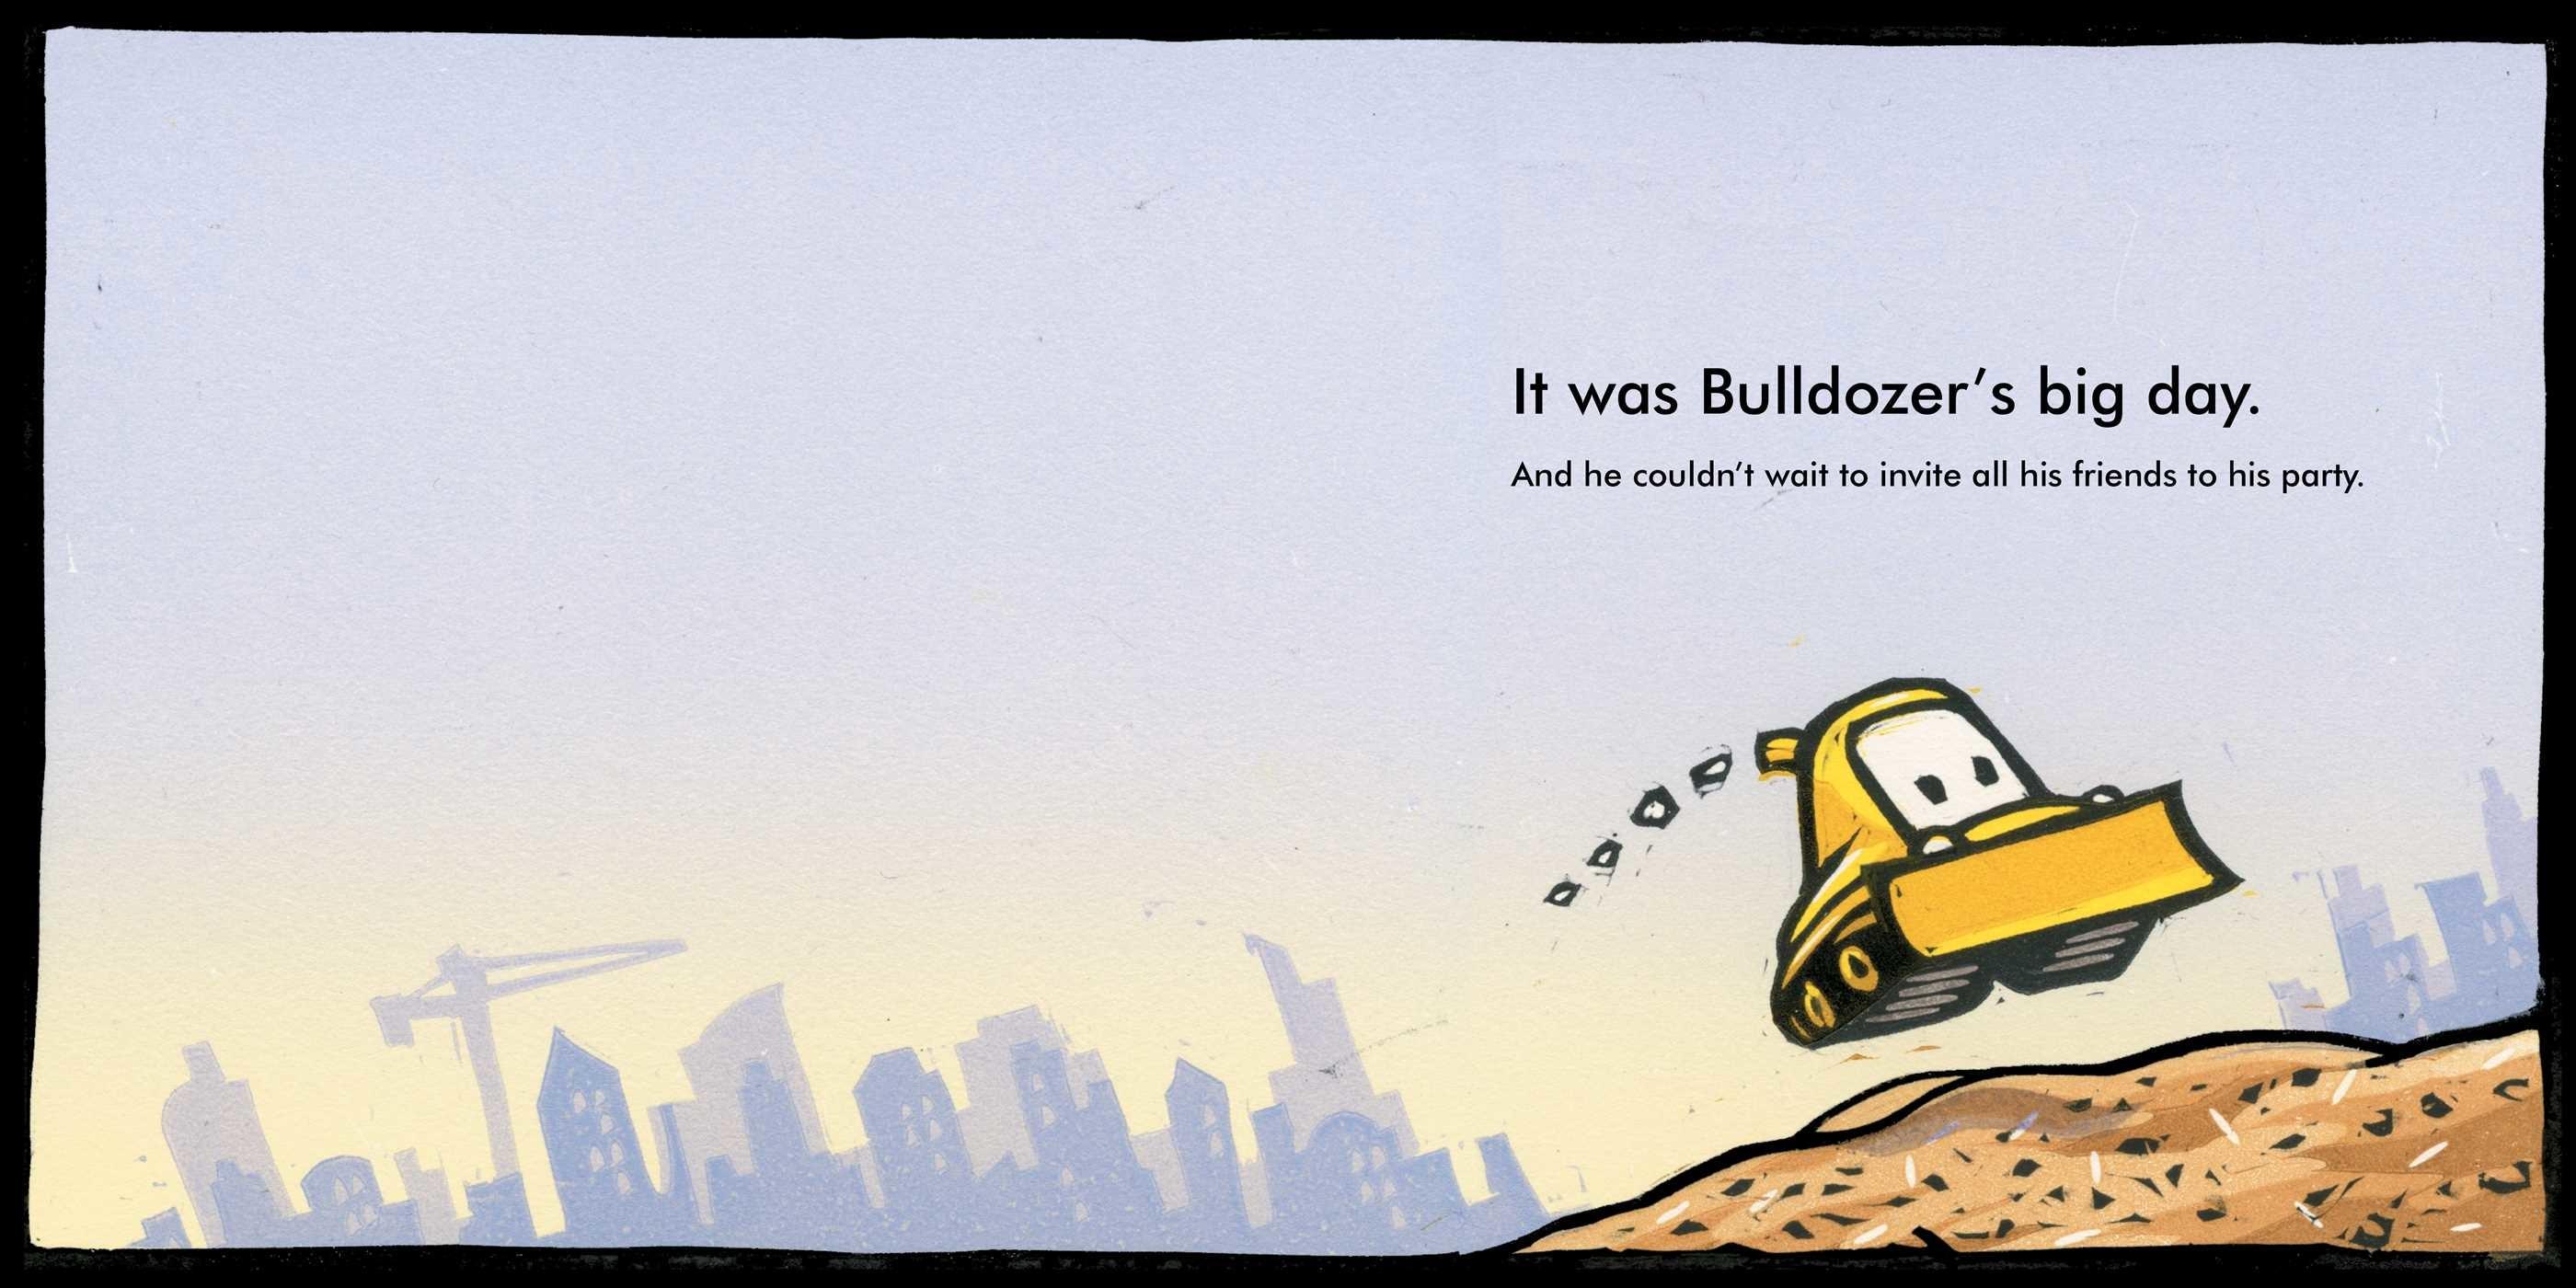 Bulldozers big day 9781481400978.in01